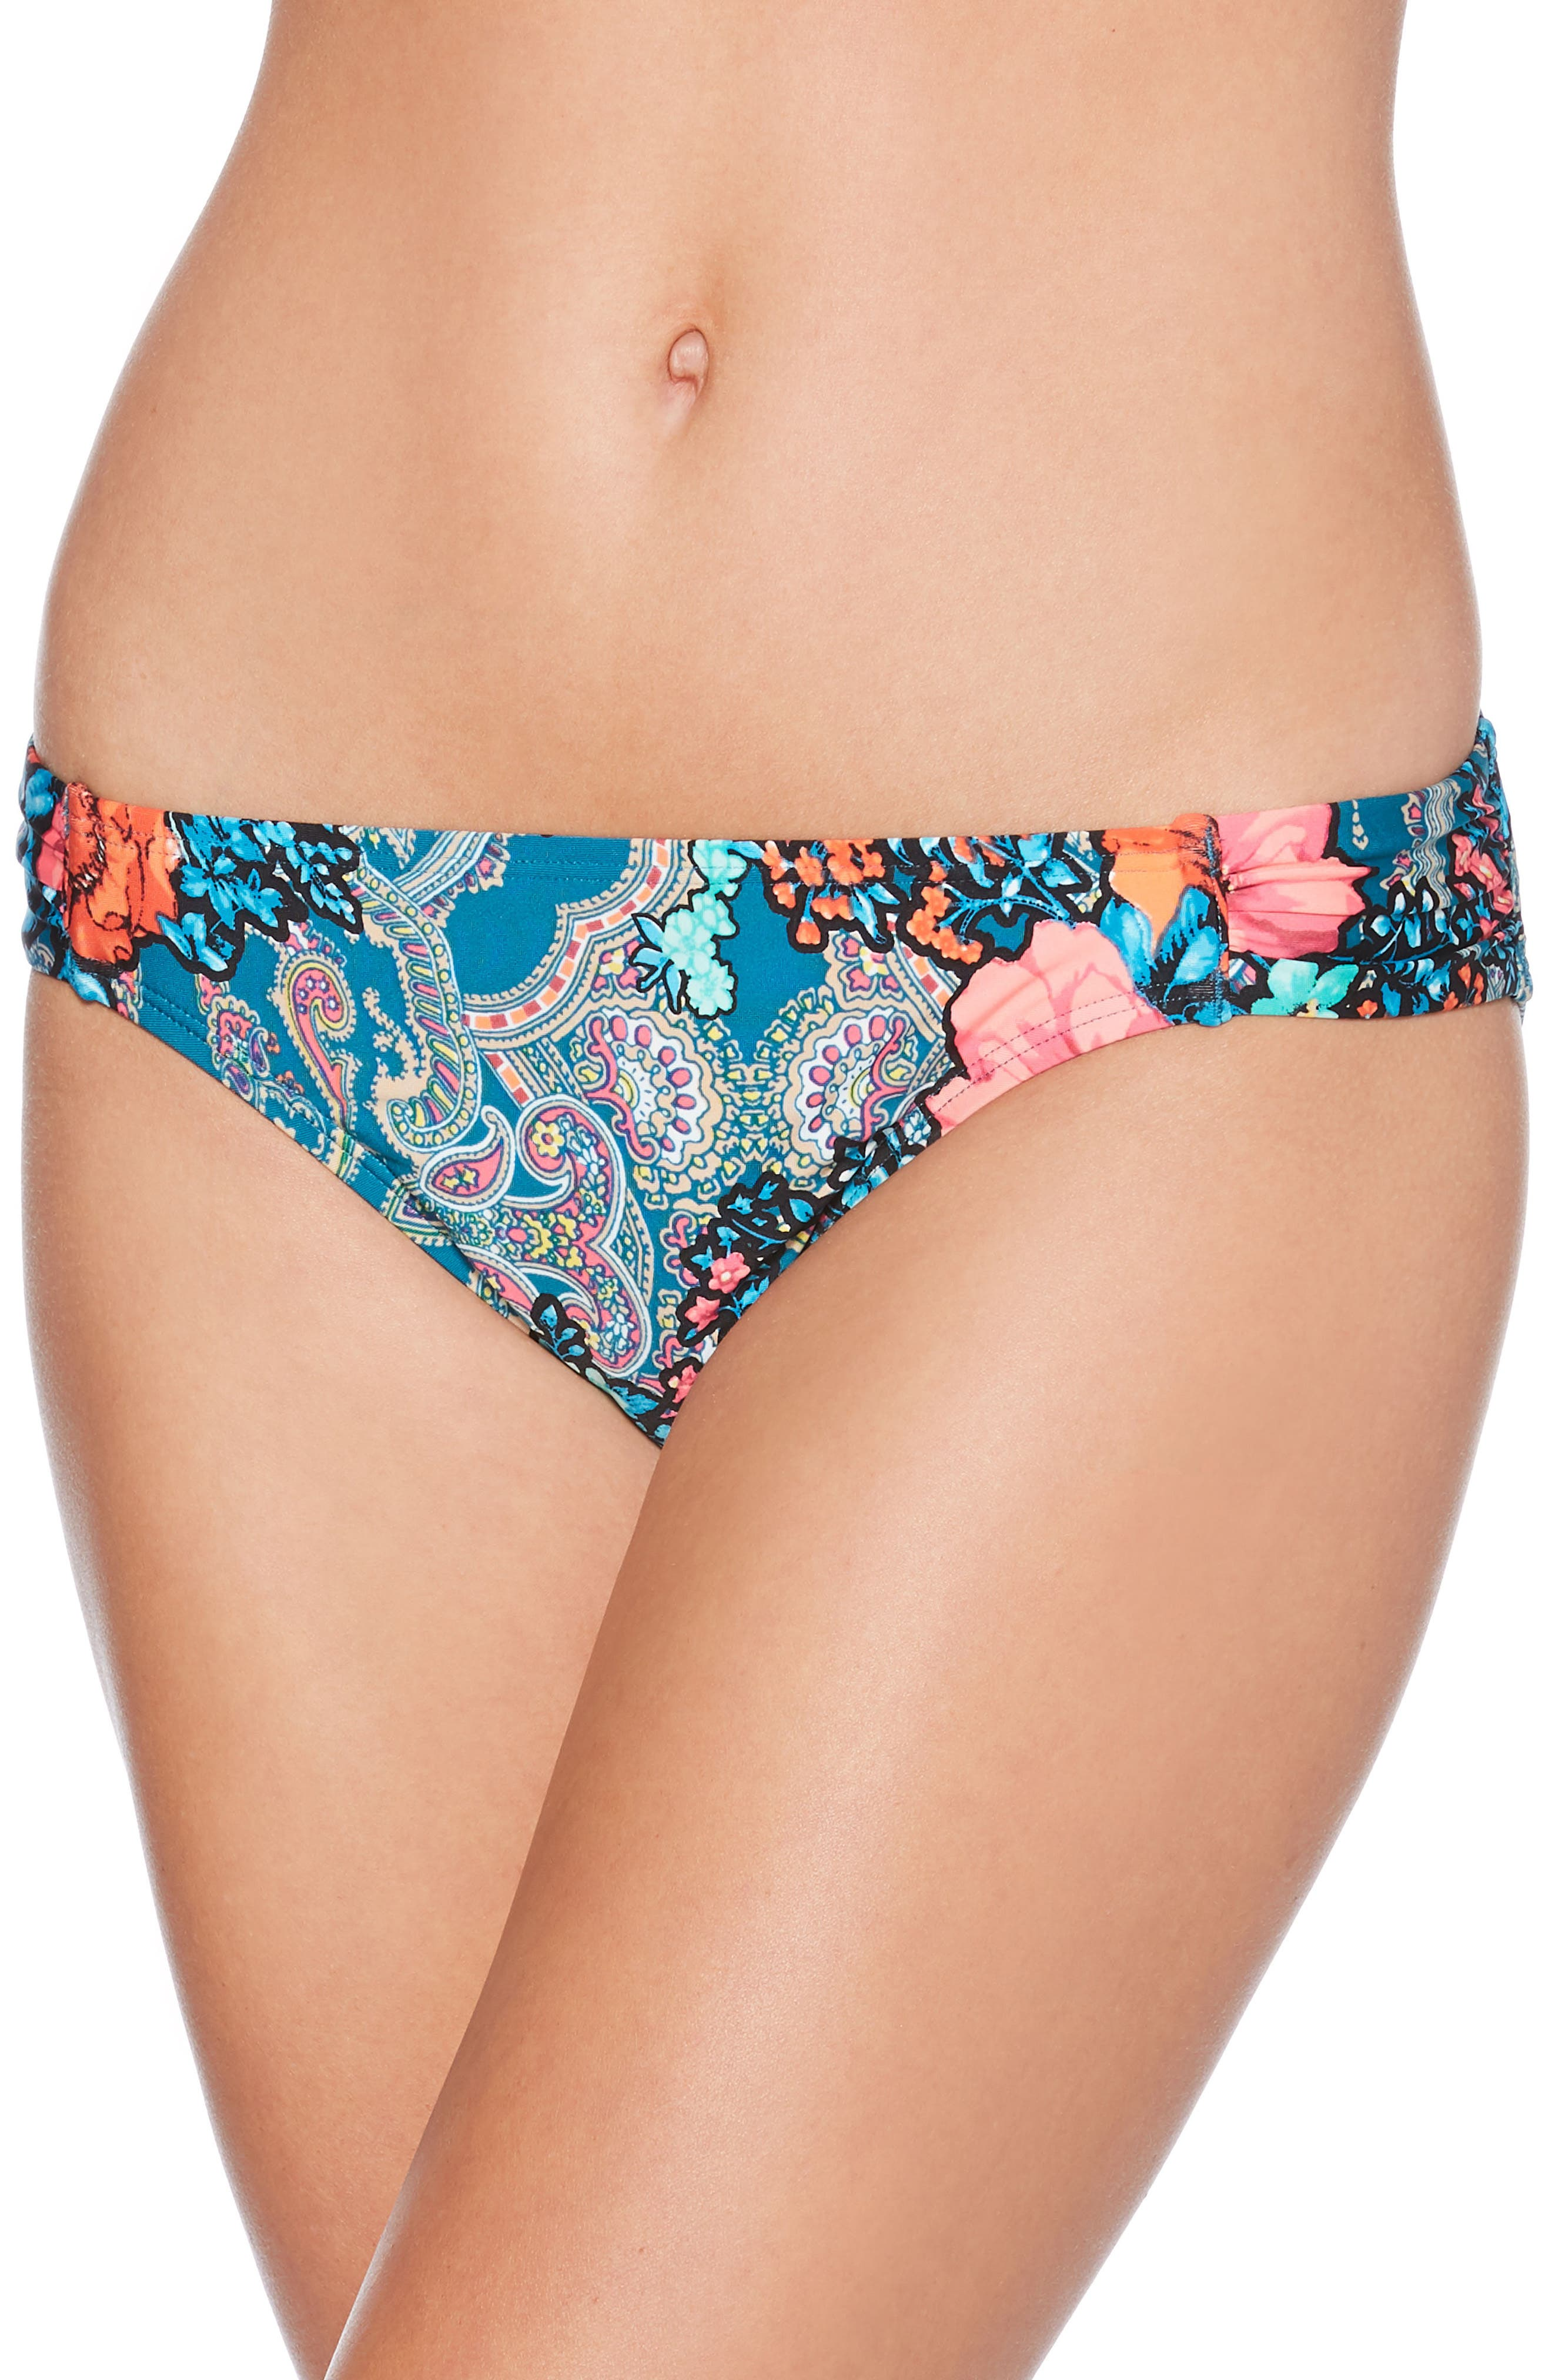 Floral Paisley Hipster Bikini Bottoms,                         Main,                         color, 440